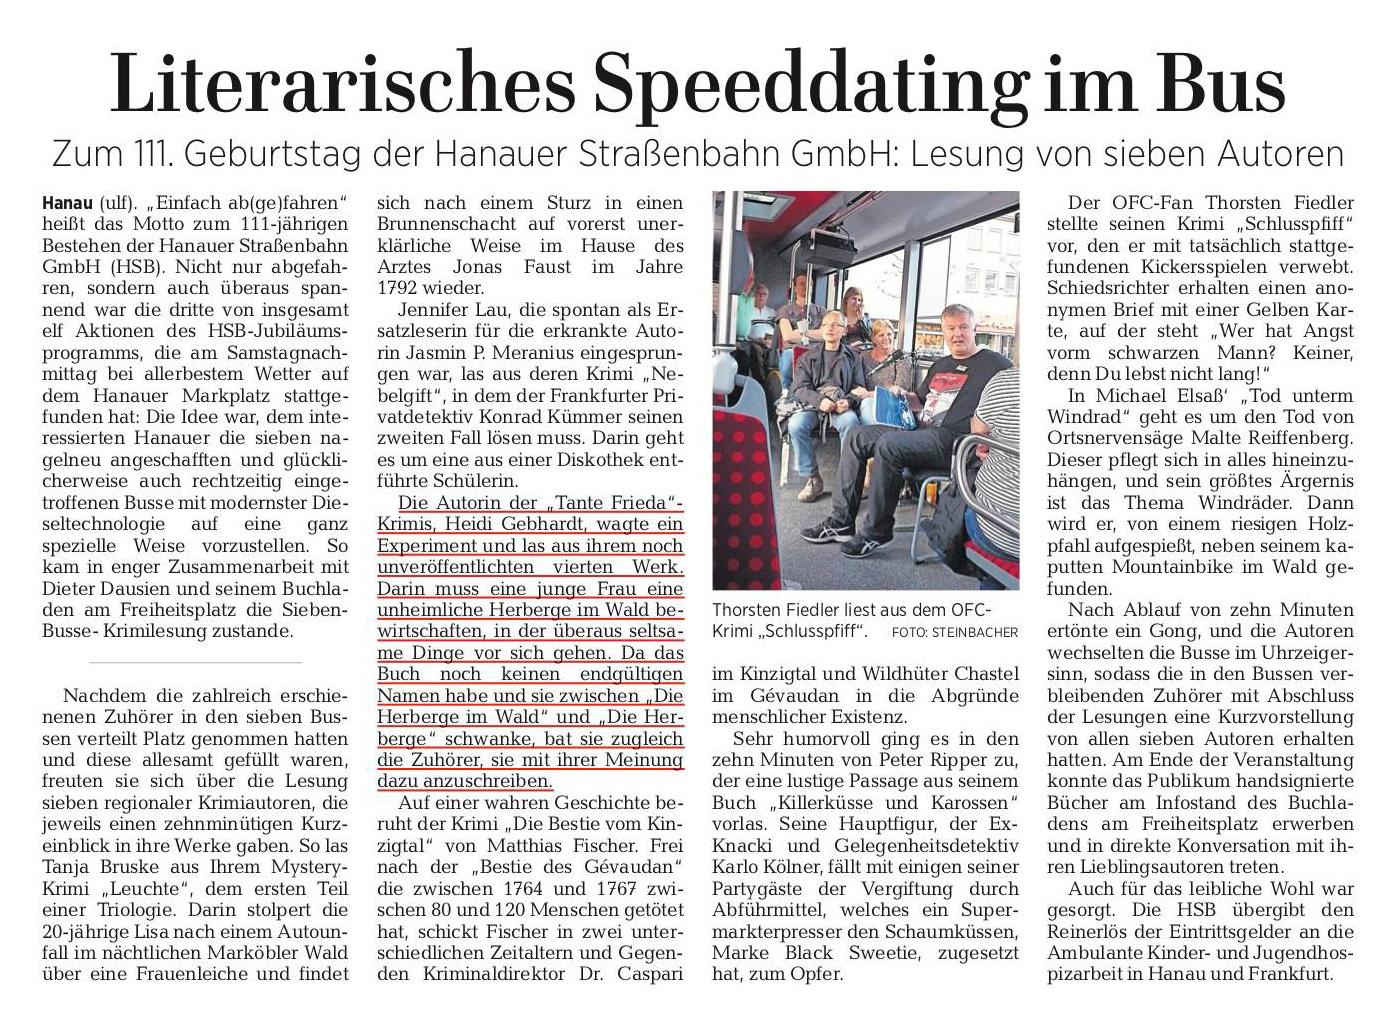 Bus-Lesung groß im Börsenblatt